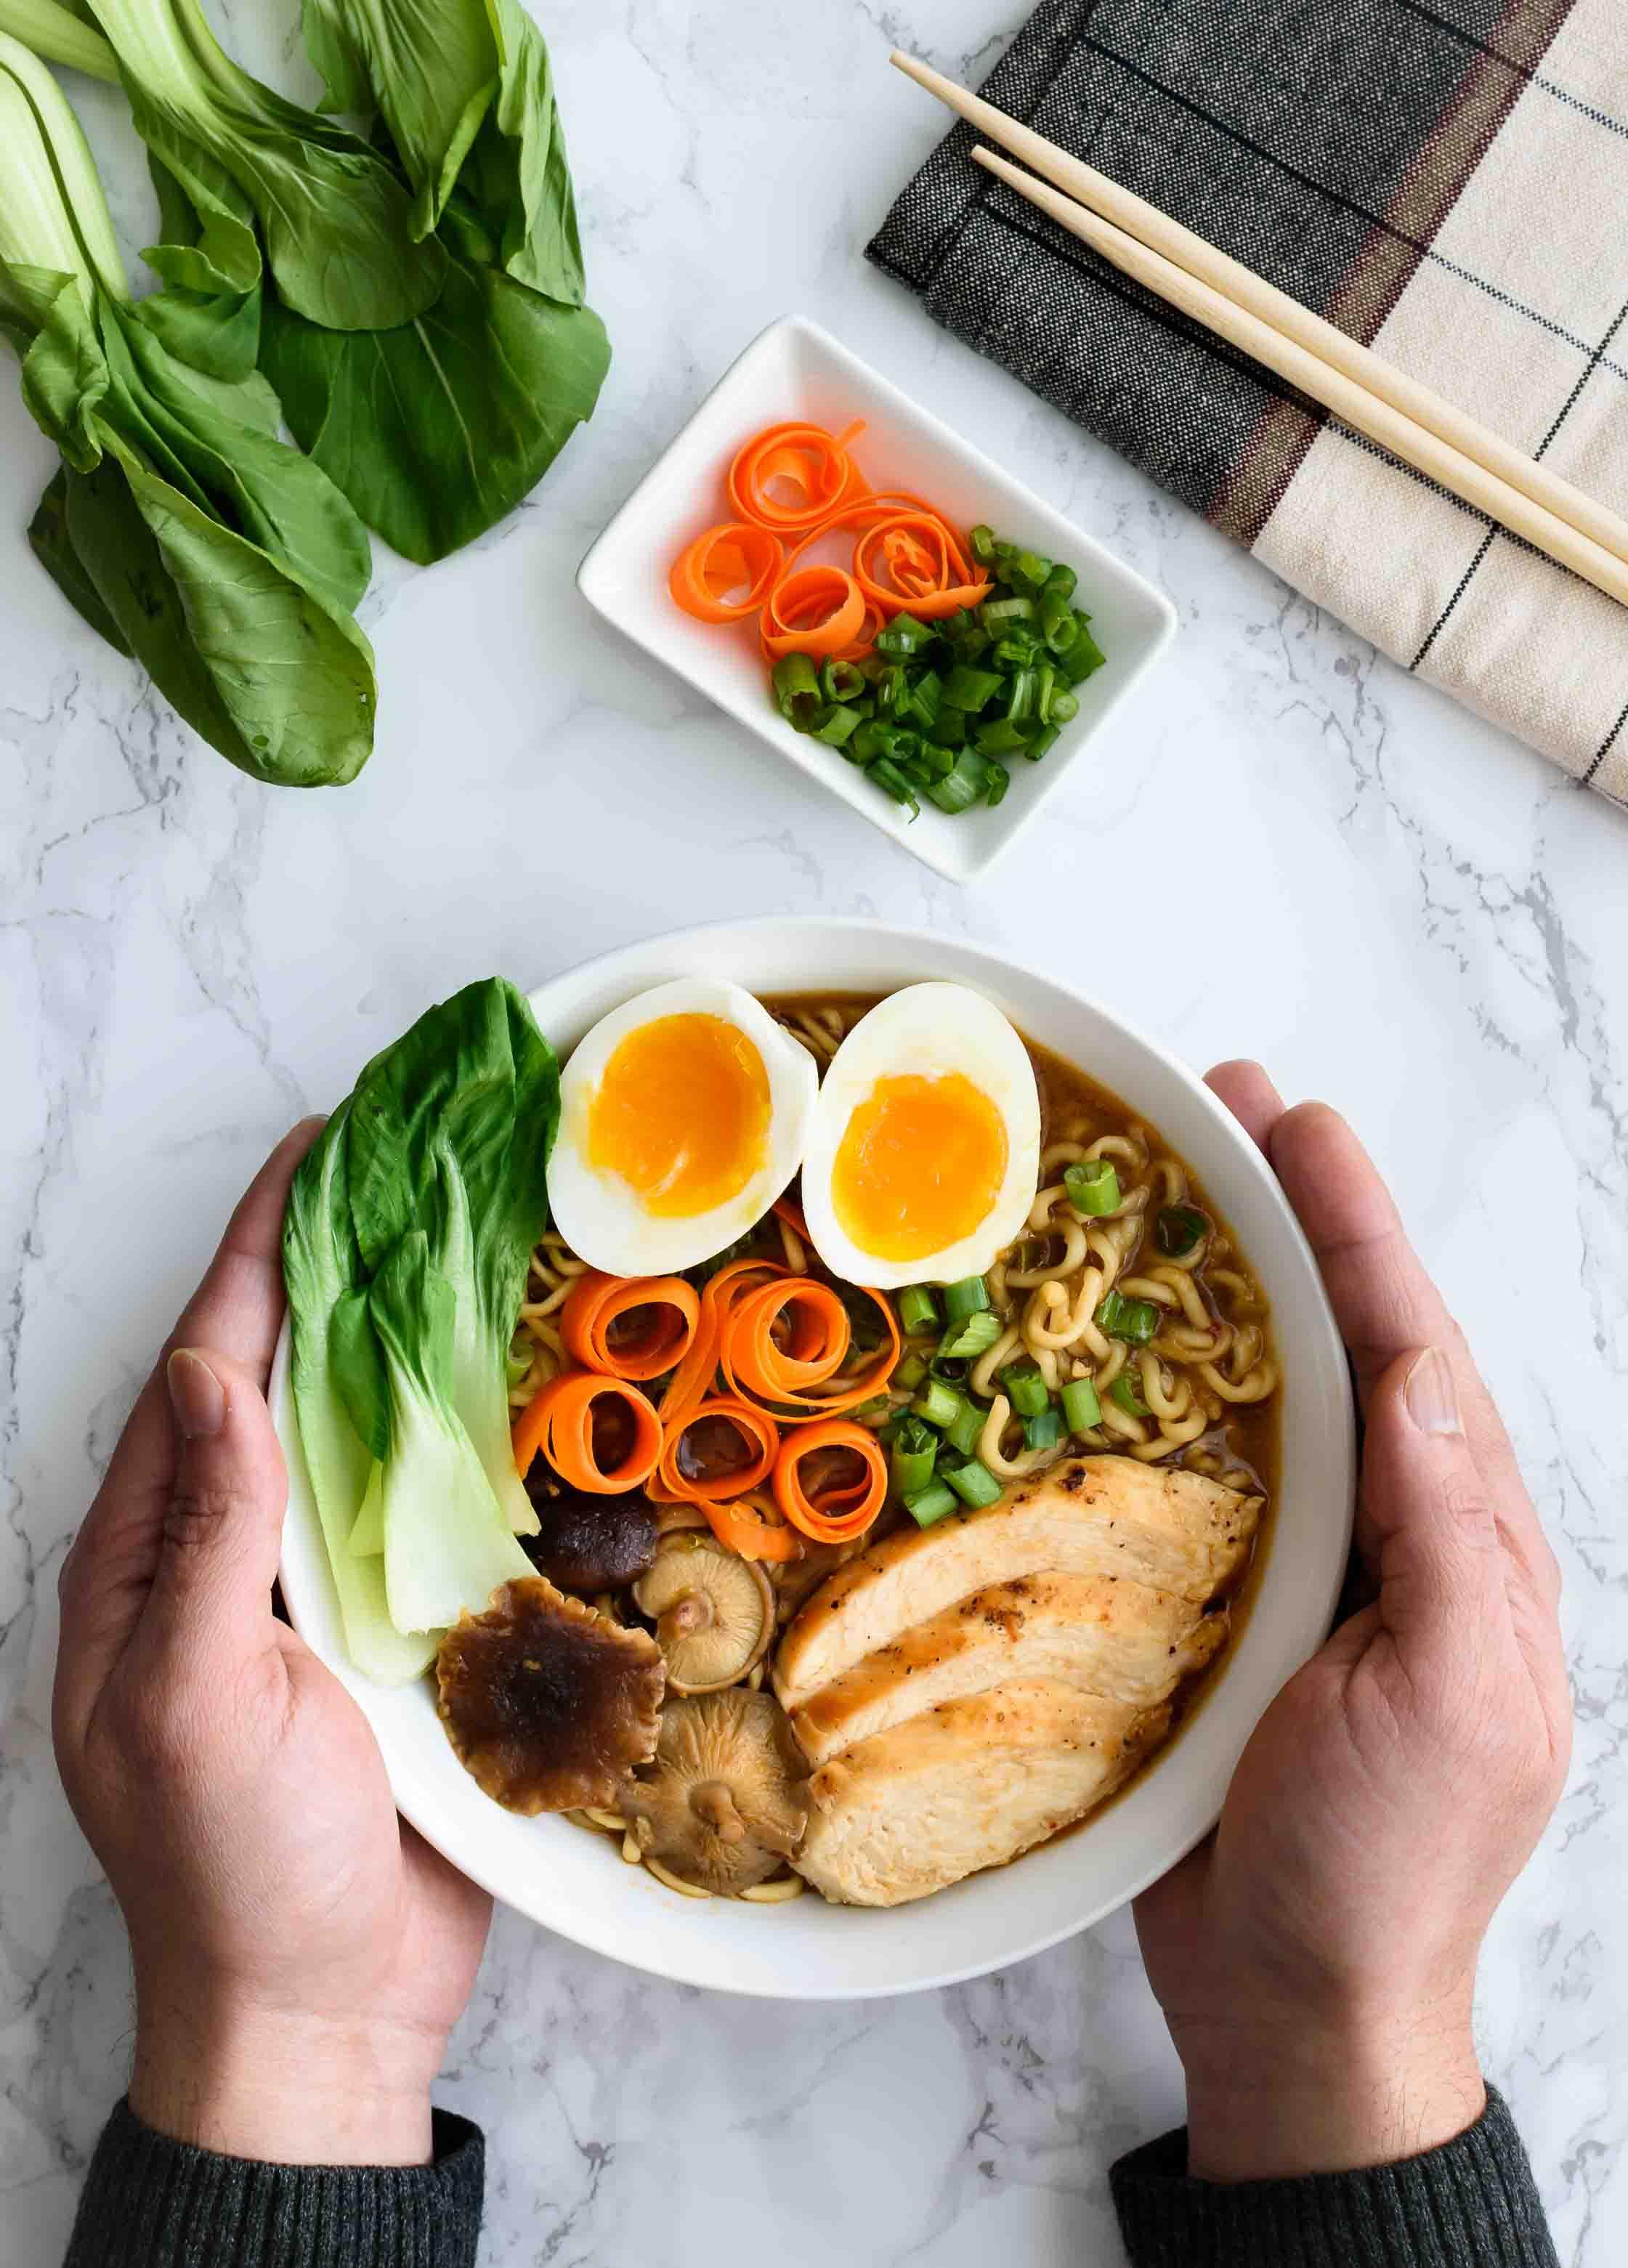 Chicken Ramen Noodle Soup- Pepper Delight #pepperdelightblog #recipe #soup #ramennoodlesoup #appetizer #ramensoup #noodlesoup #winterrecipes #dinner #ramen #homemadesoup #asianrecipes #wintersoup